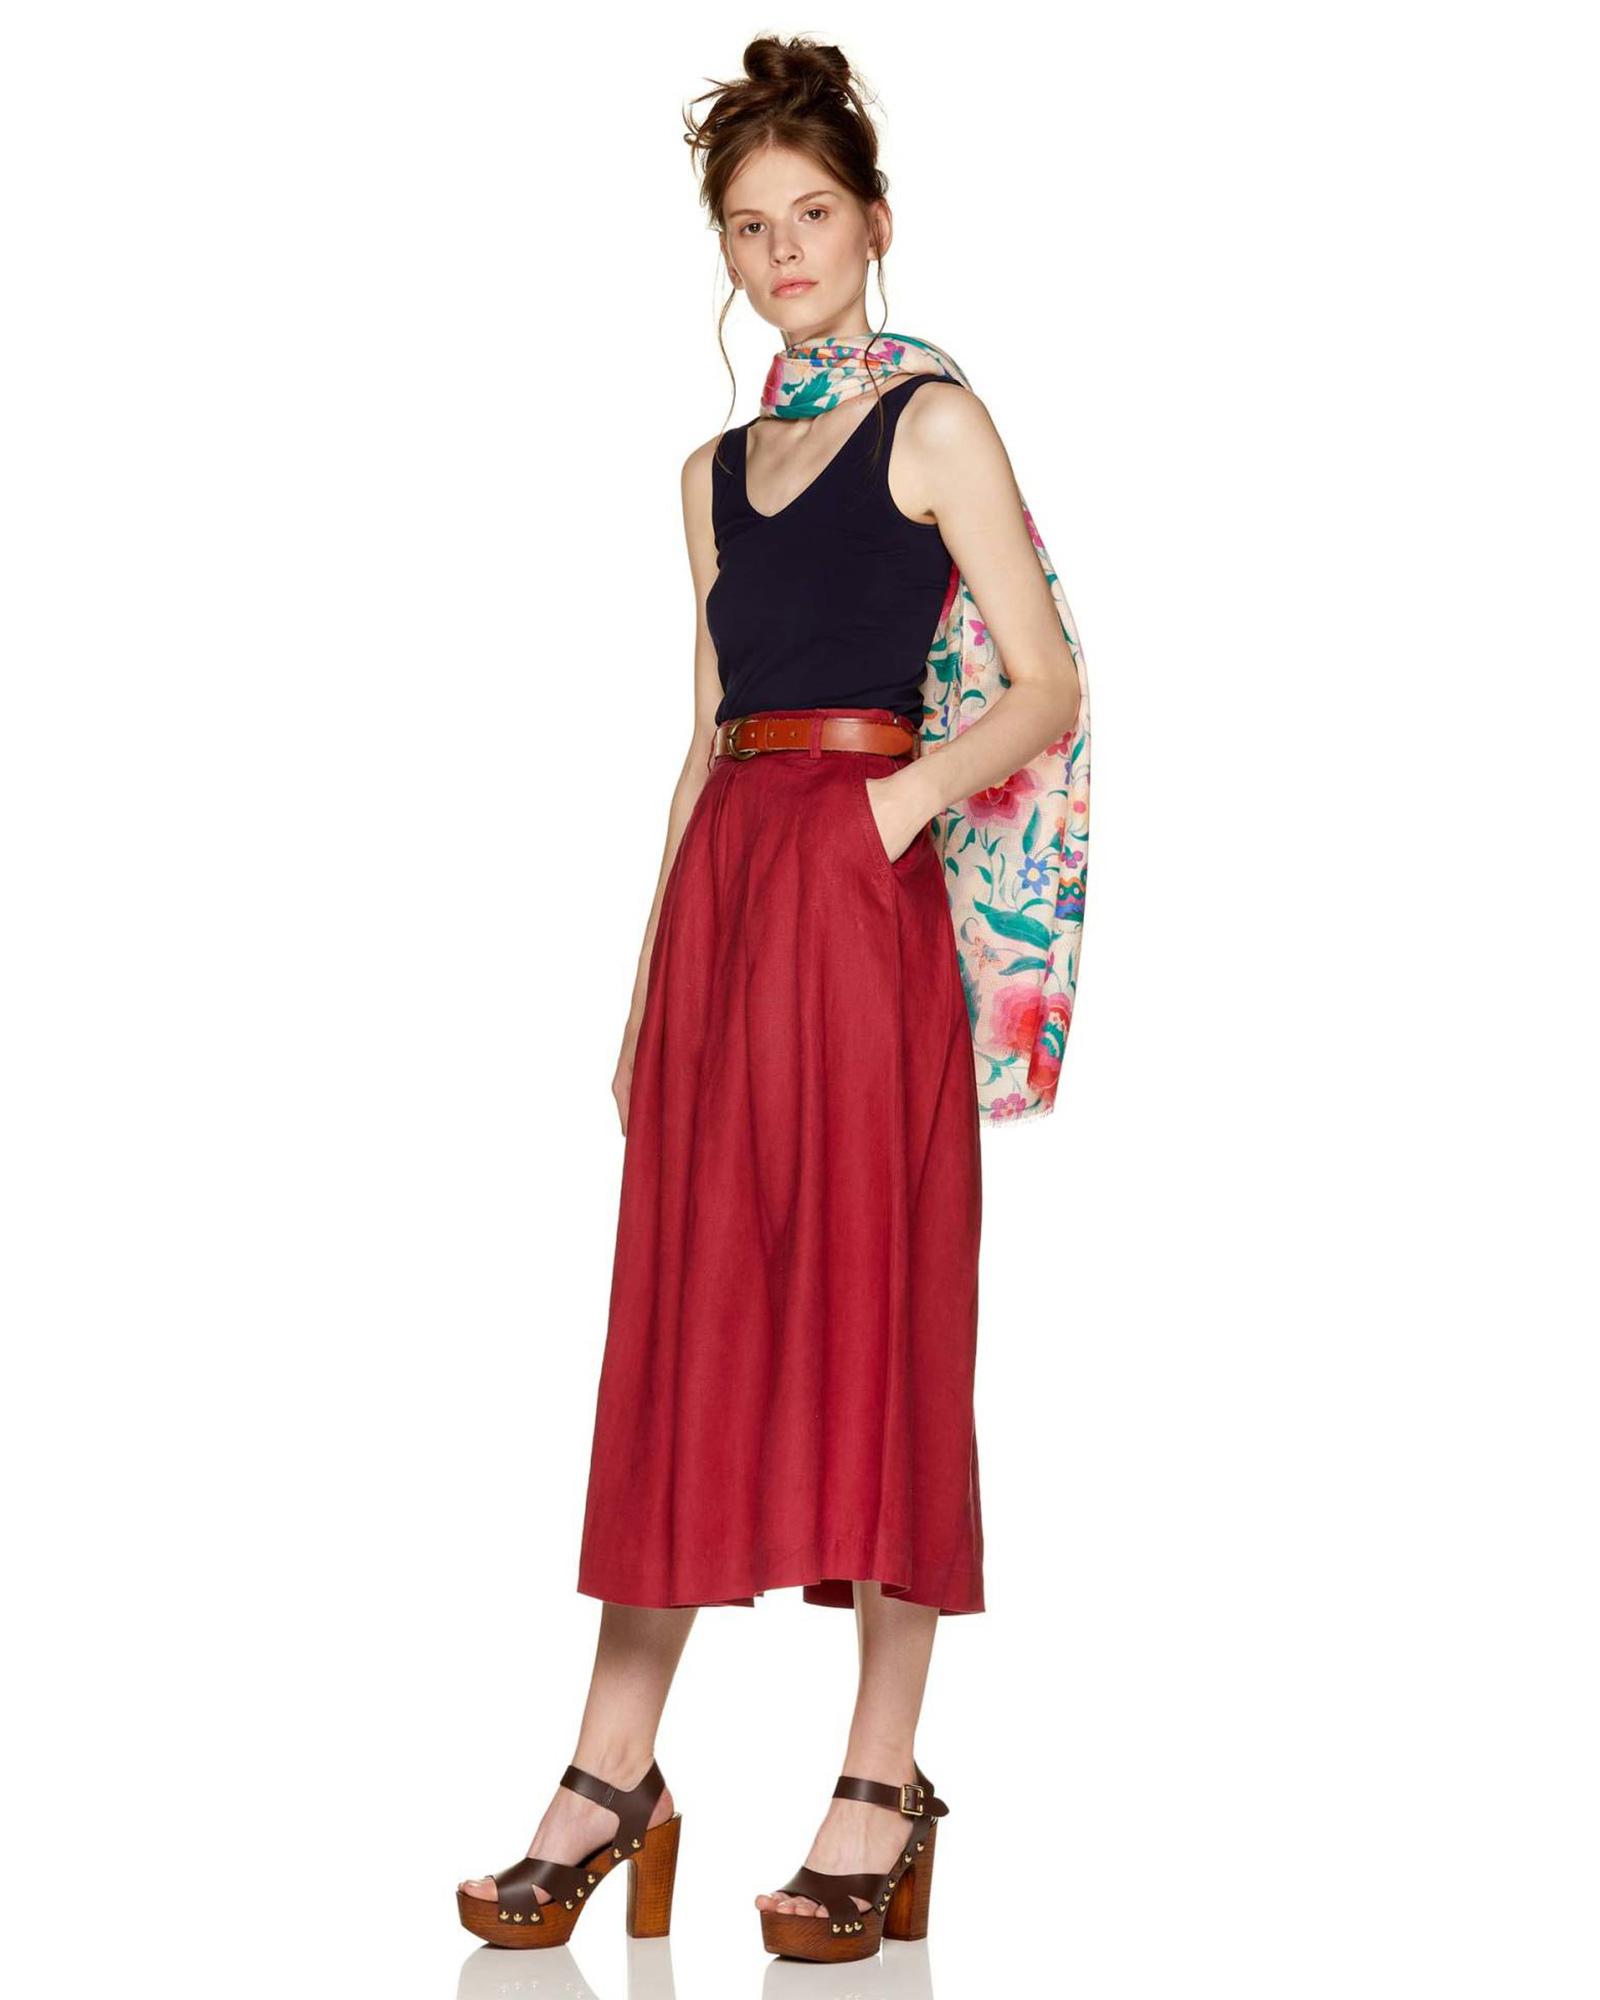 645d1705c33 Γυναικεία Ένδυση Νέα Collection 2019 | Benetton